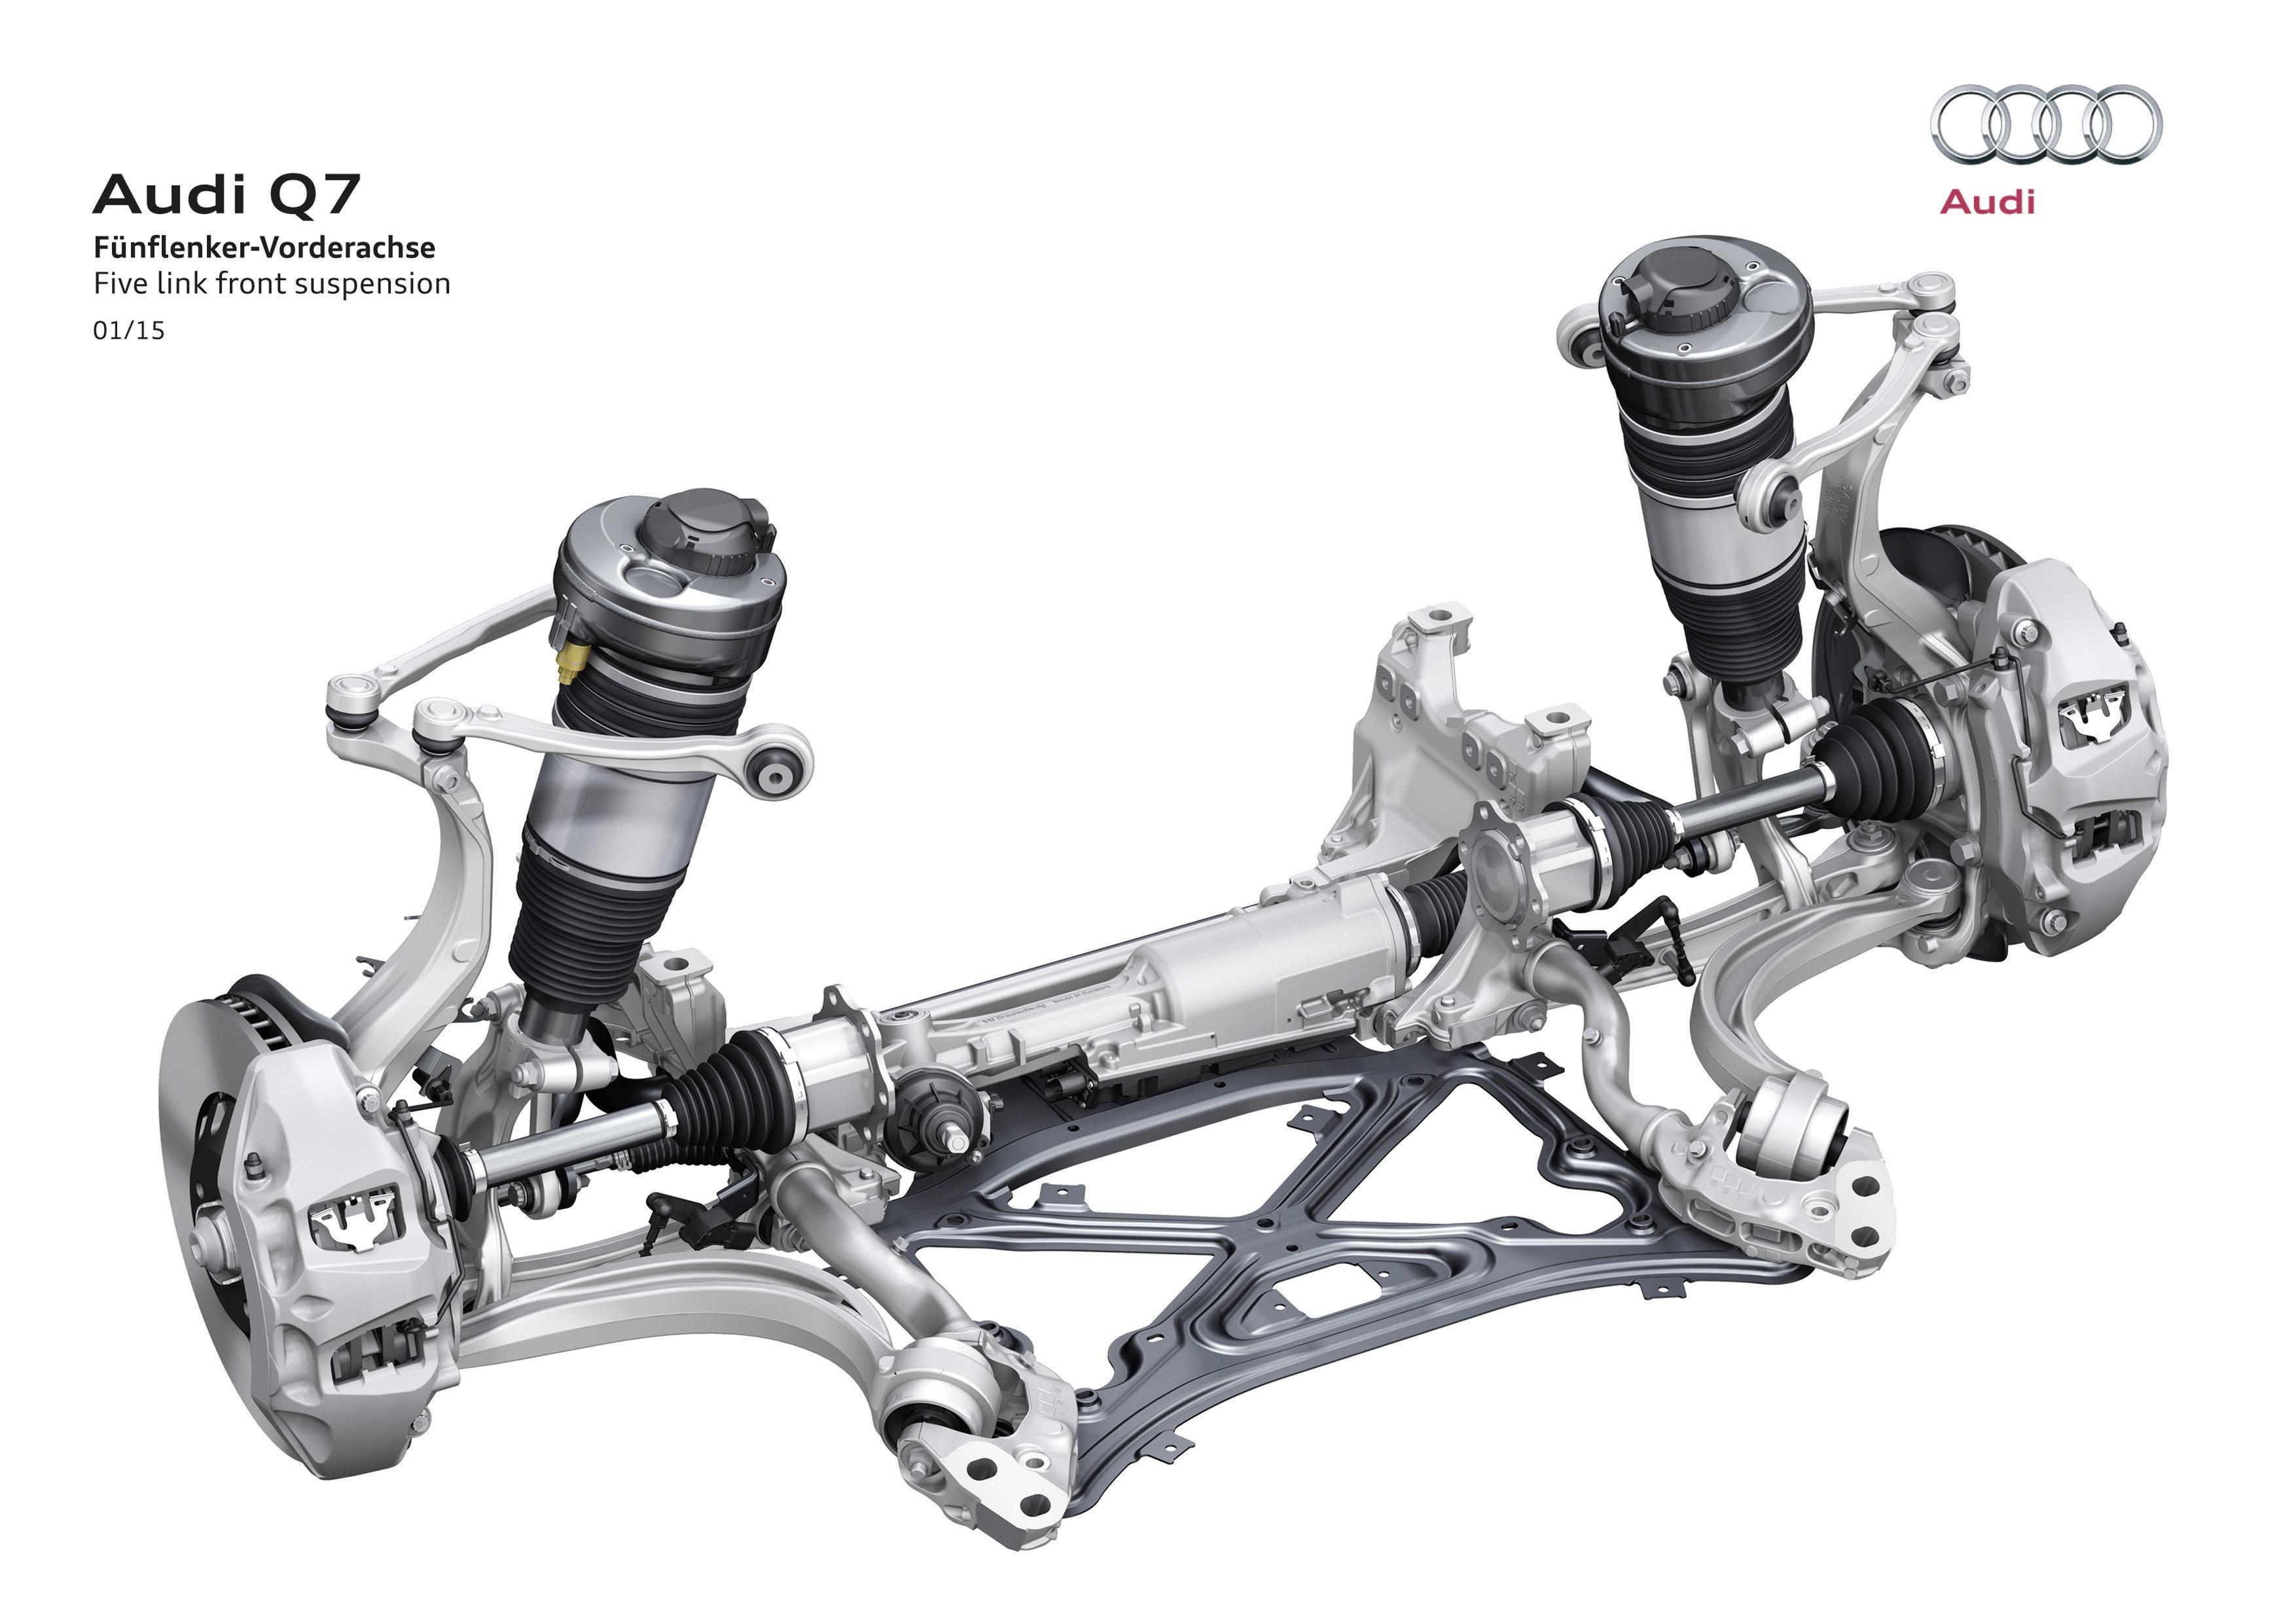 Brake Caliper Bolt Tightening Torque 2901968 in addition 2015 Kia Sorento Wiring Diagram as well 1007 Audi Q7 likewise 2004 2 0tdi A3 Fuse Diagram besides Audi A4 B7 Engine Diagram. on 2016 audi a6